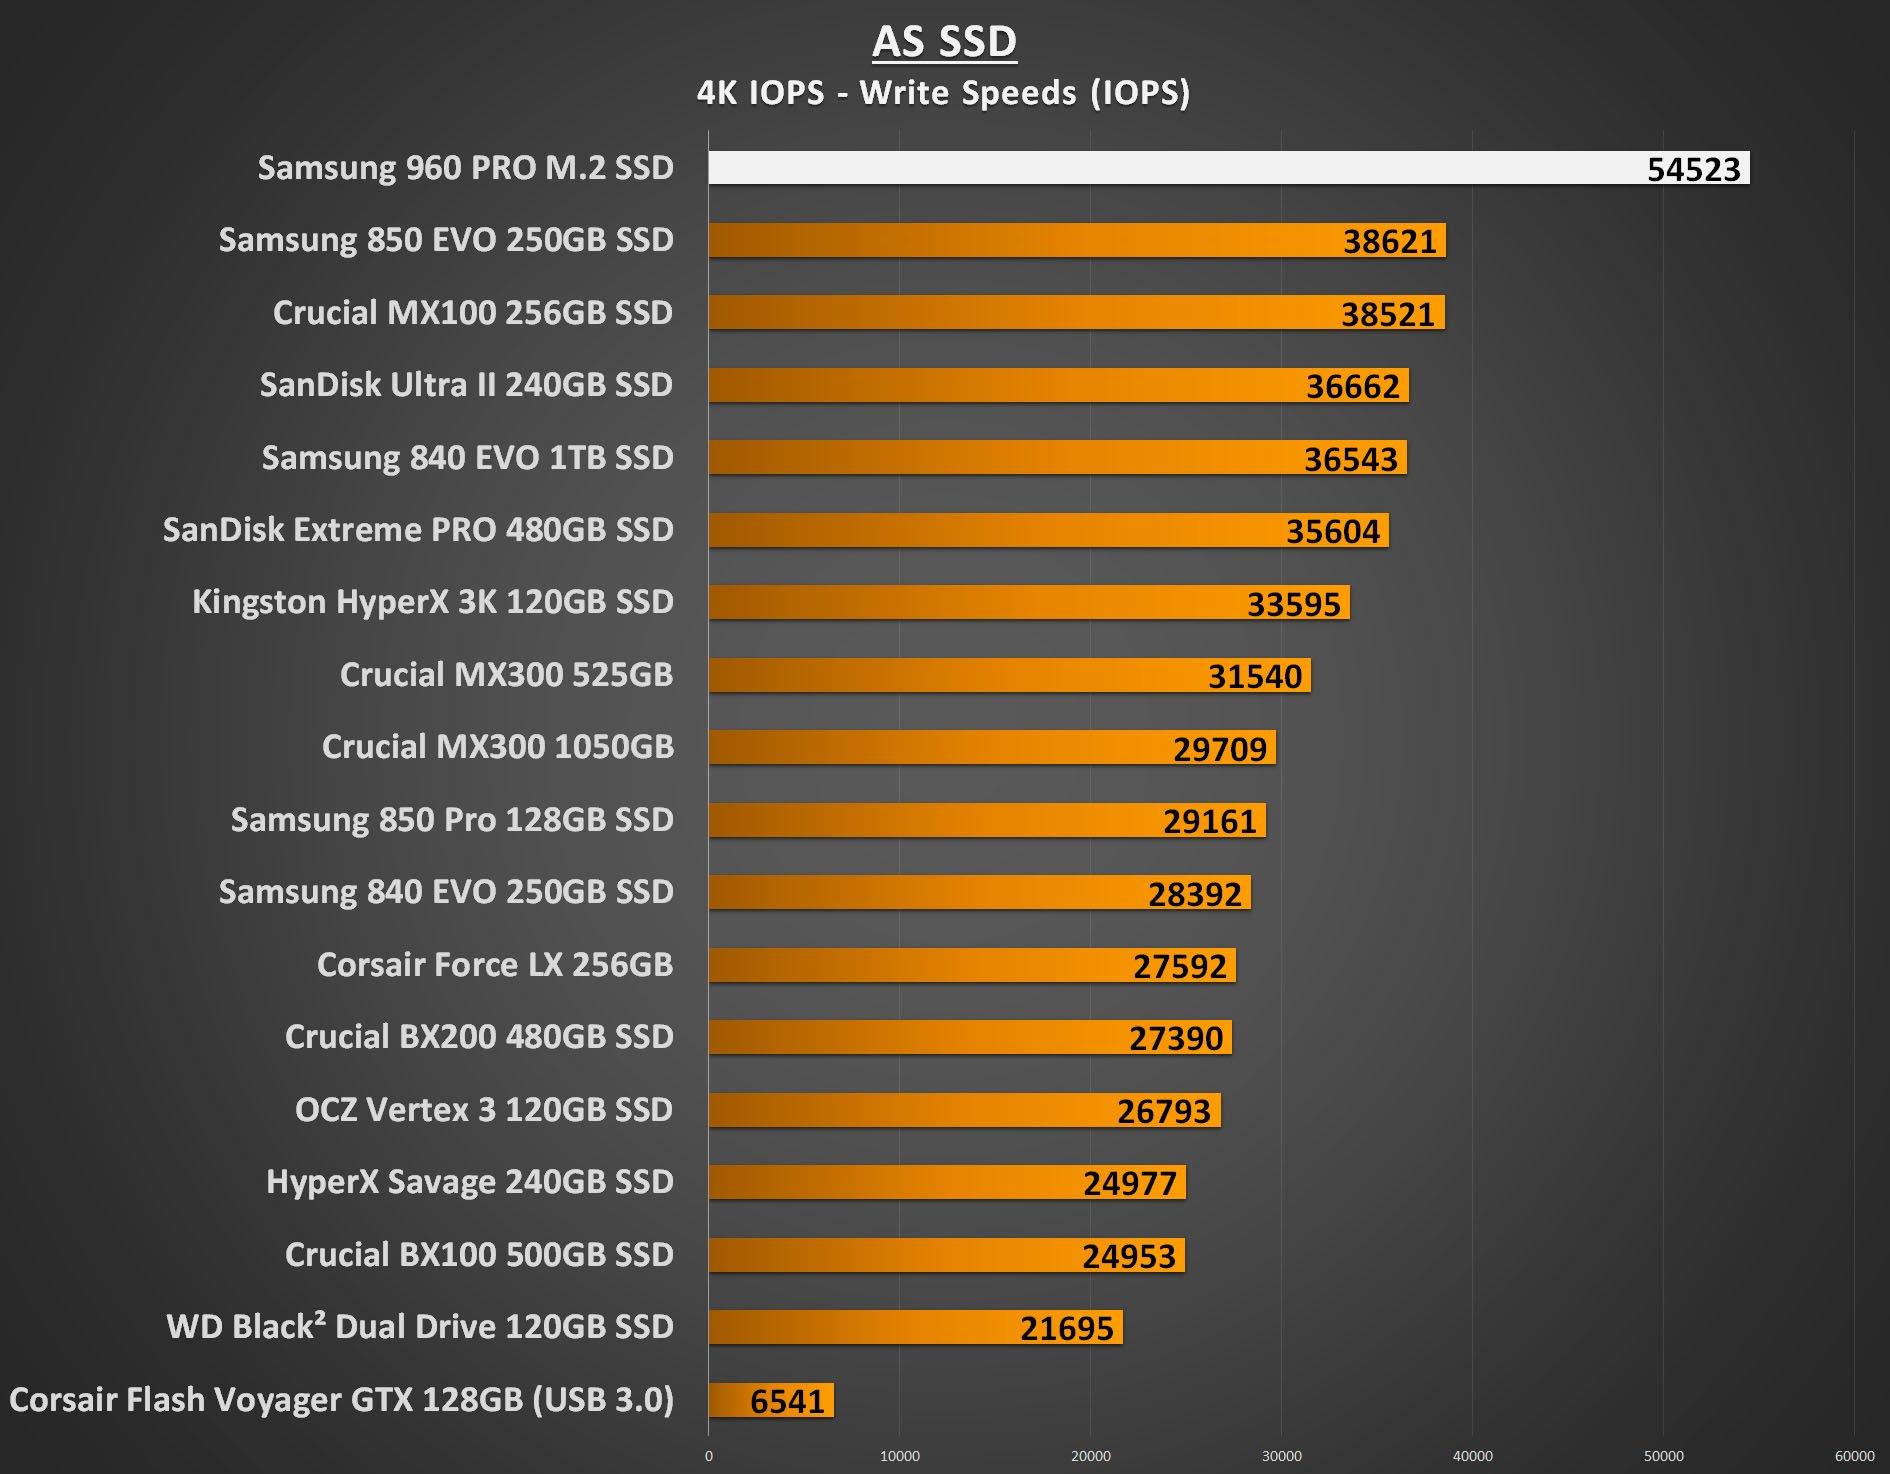 Samsung 960 PRO 1TB Performance - AS SSD 4K IOPS Write